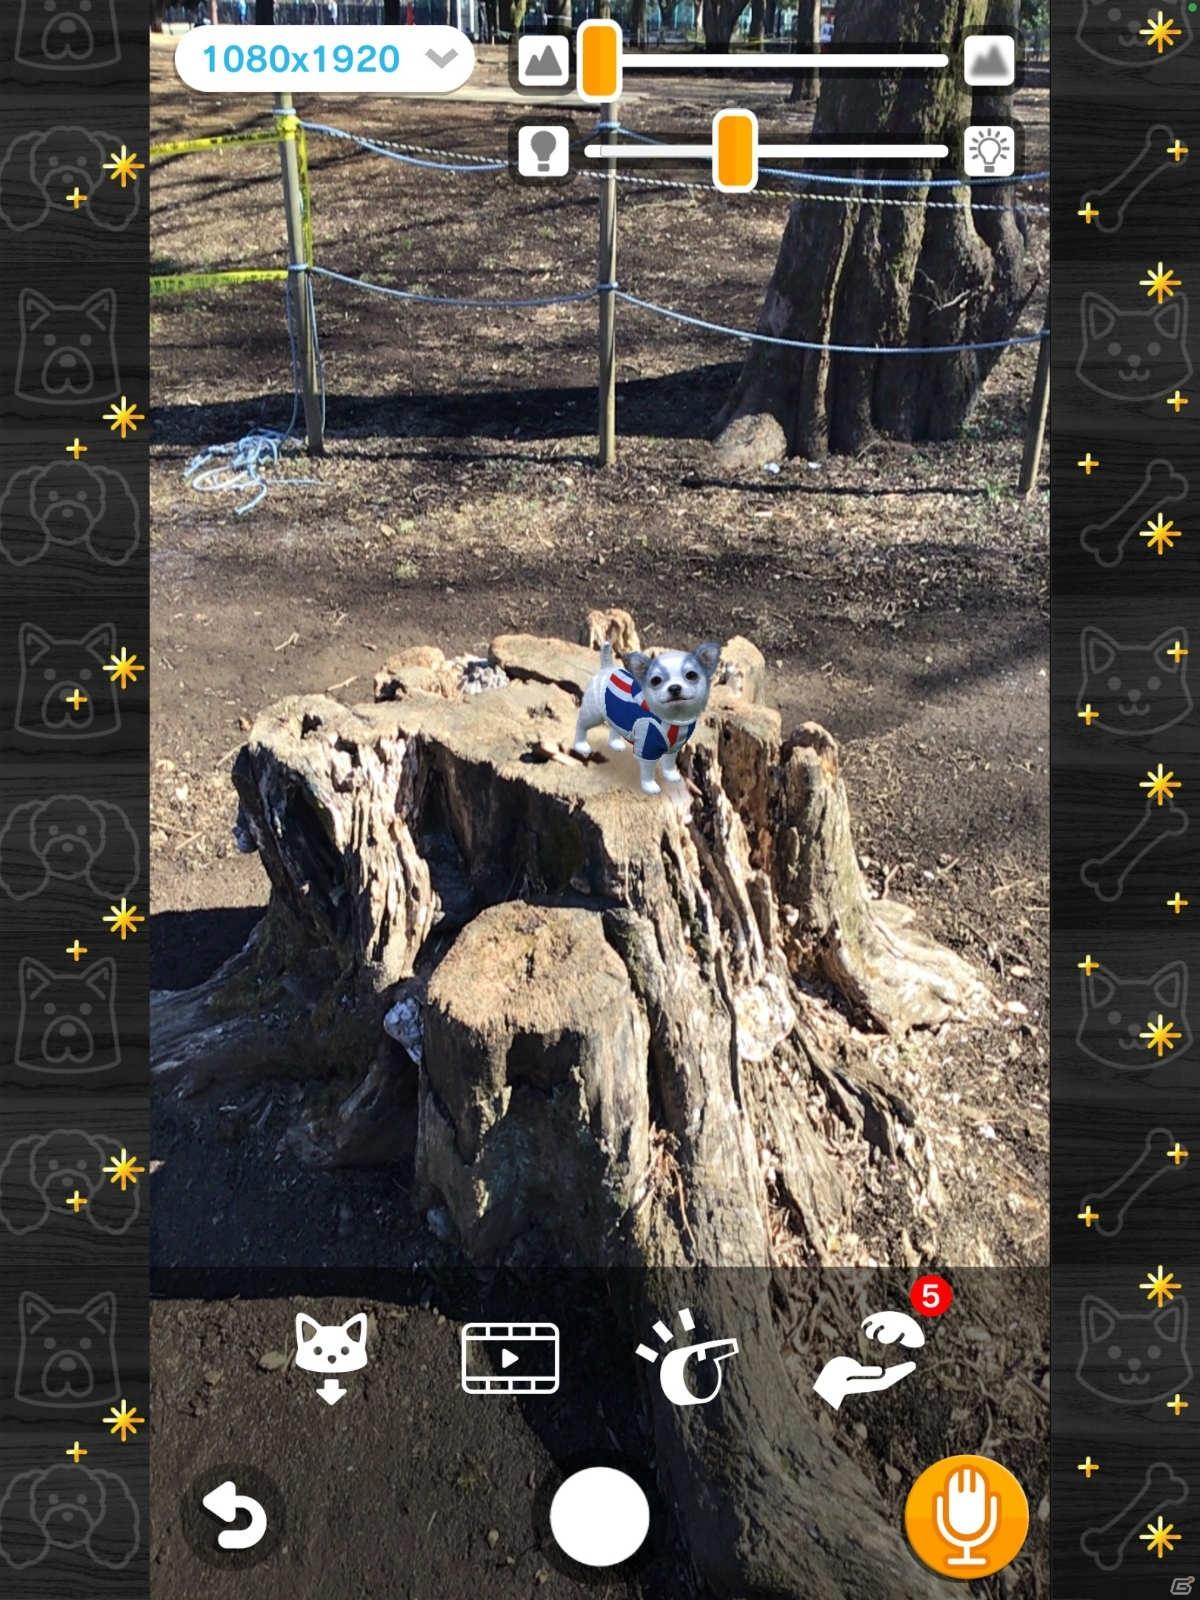 AR撮影も楽しめる育成シミュレーション「with My DOG - 犬とくらそう -」のAndroid版が配信!